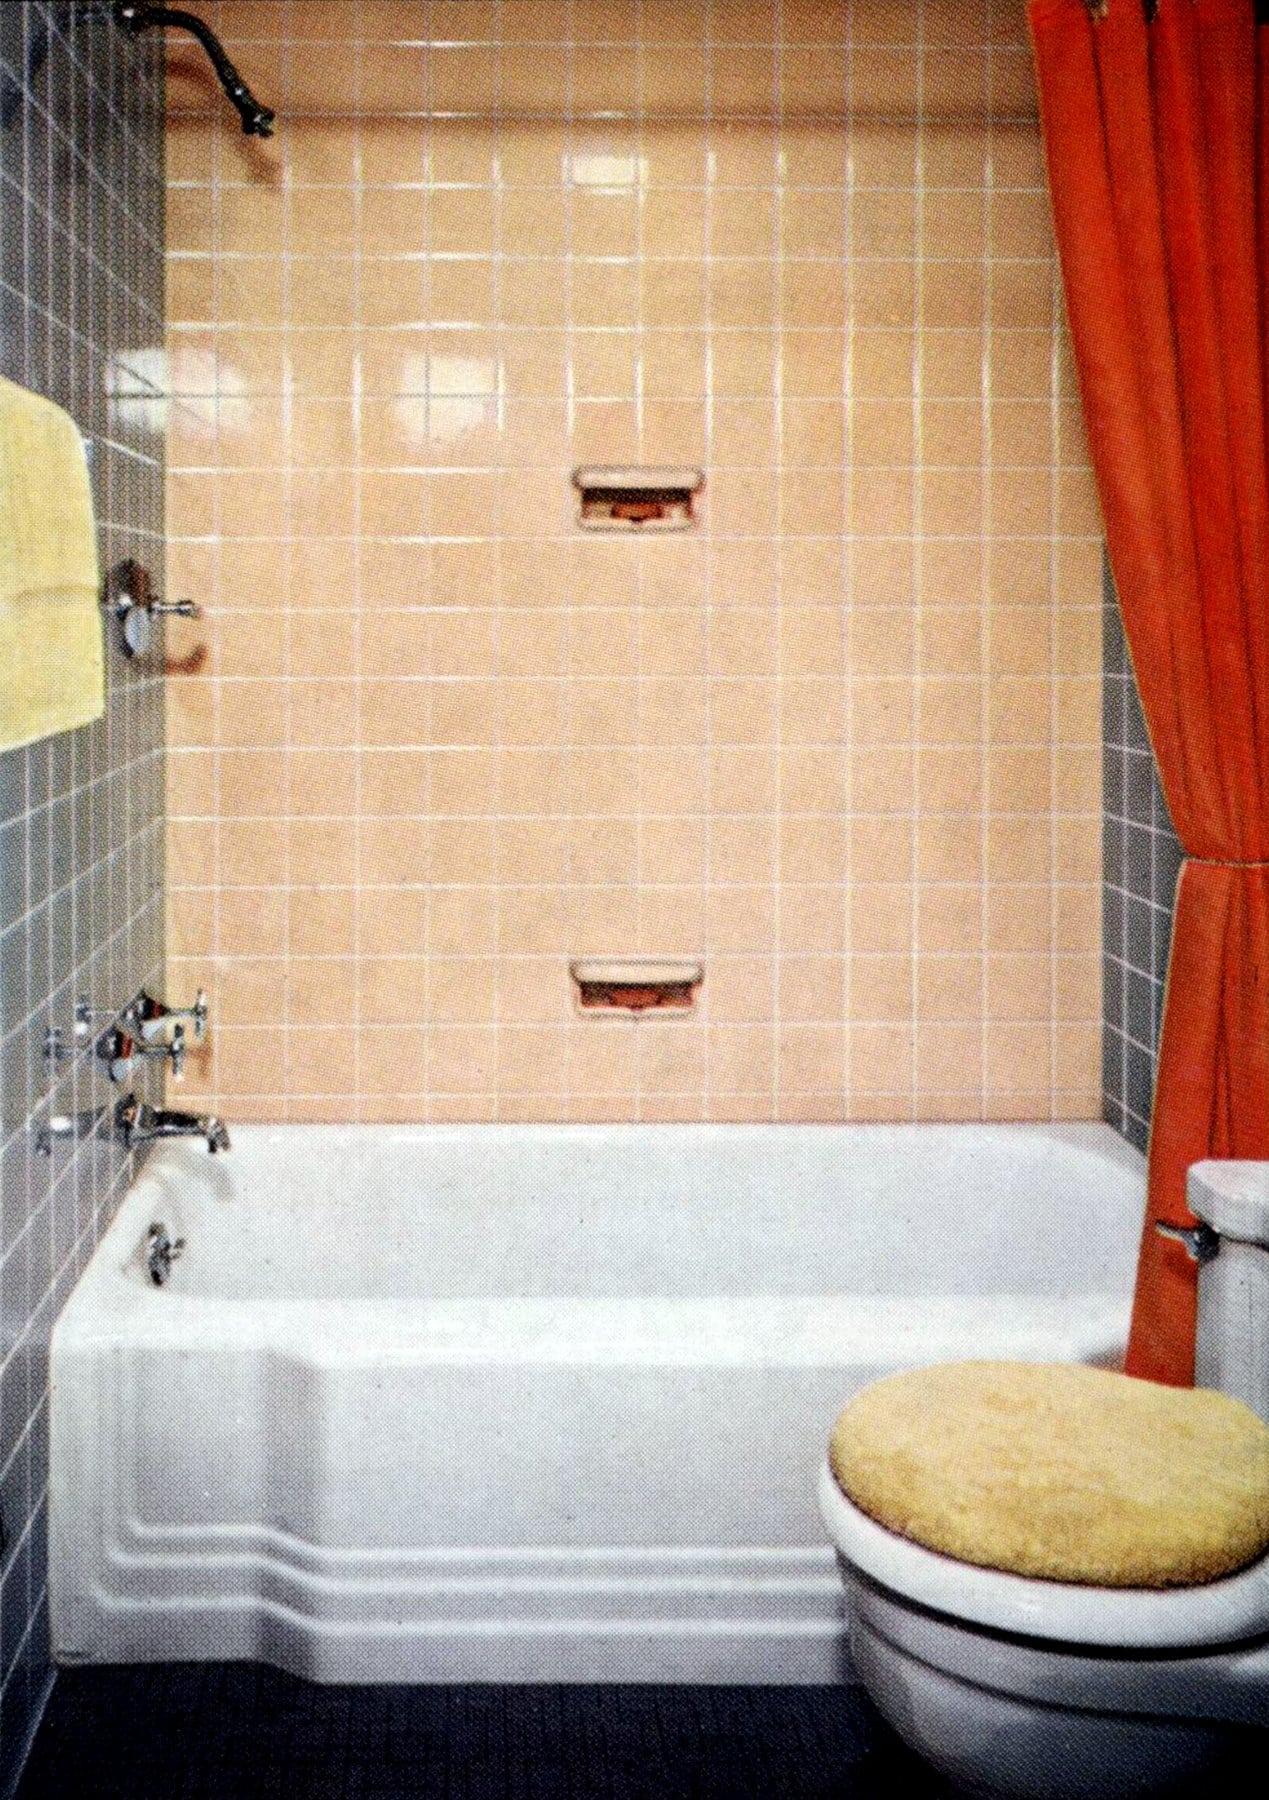 Basic peachy beige and gray bathroom decor from teh 1950s